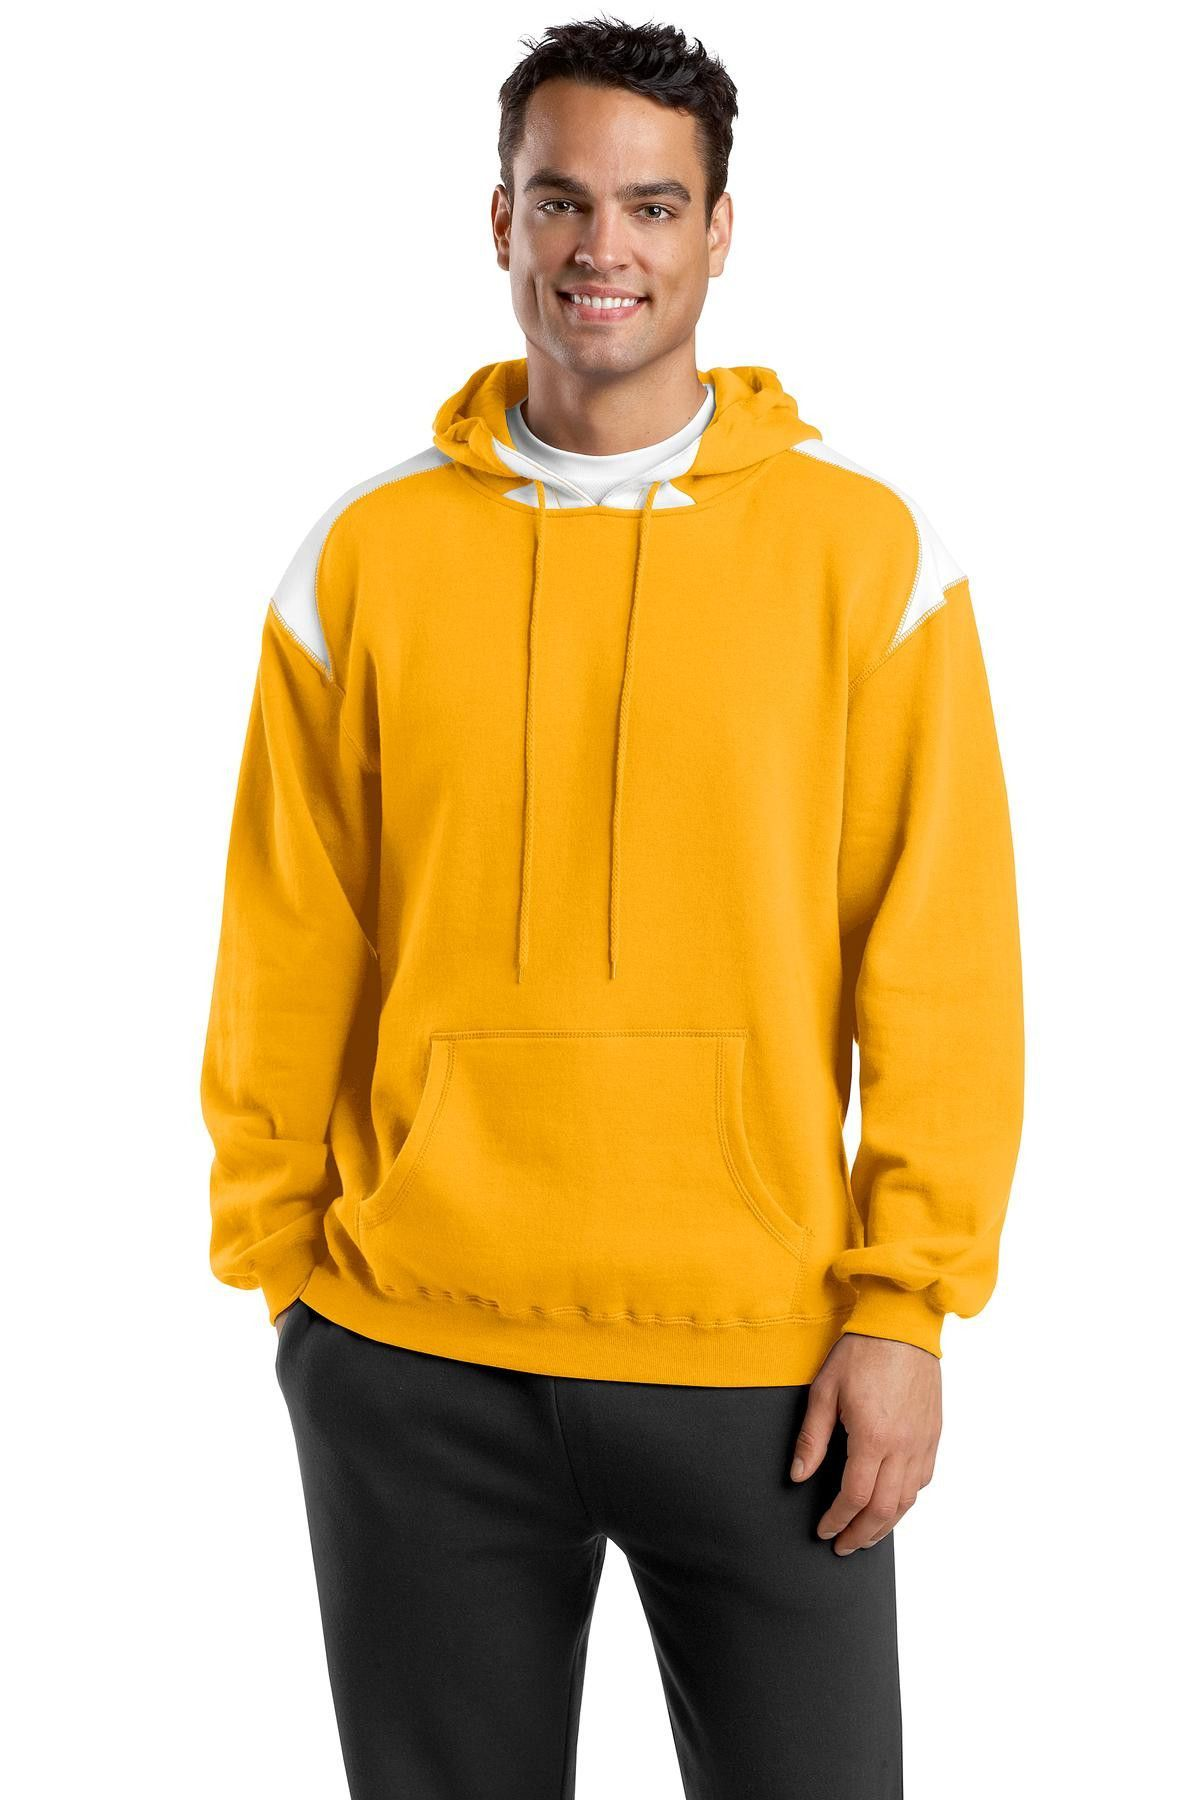 SportTek Pullover Hooded Sweatshirt with Contrast Color